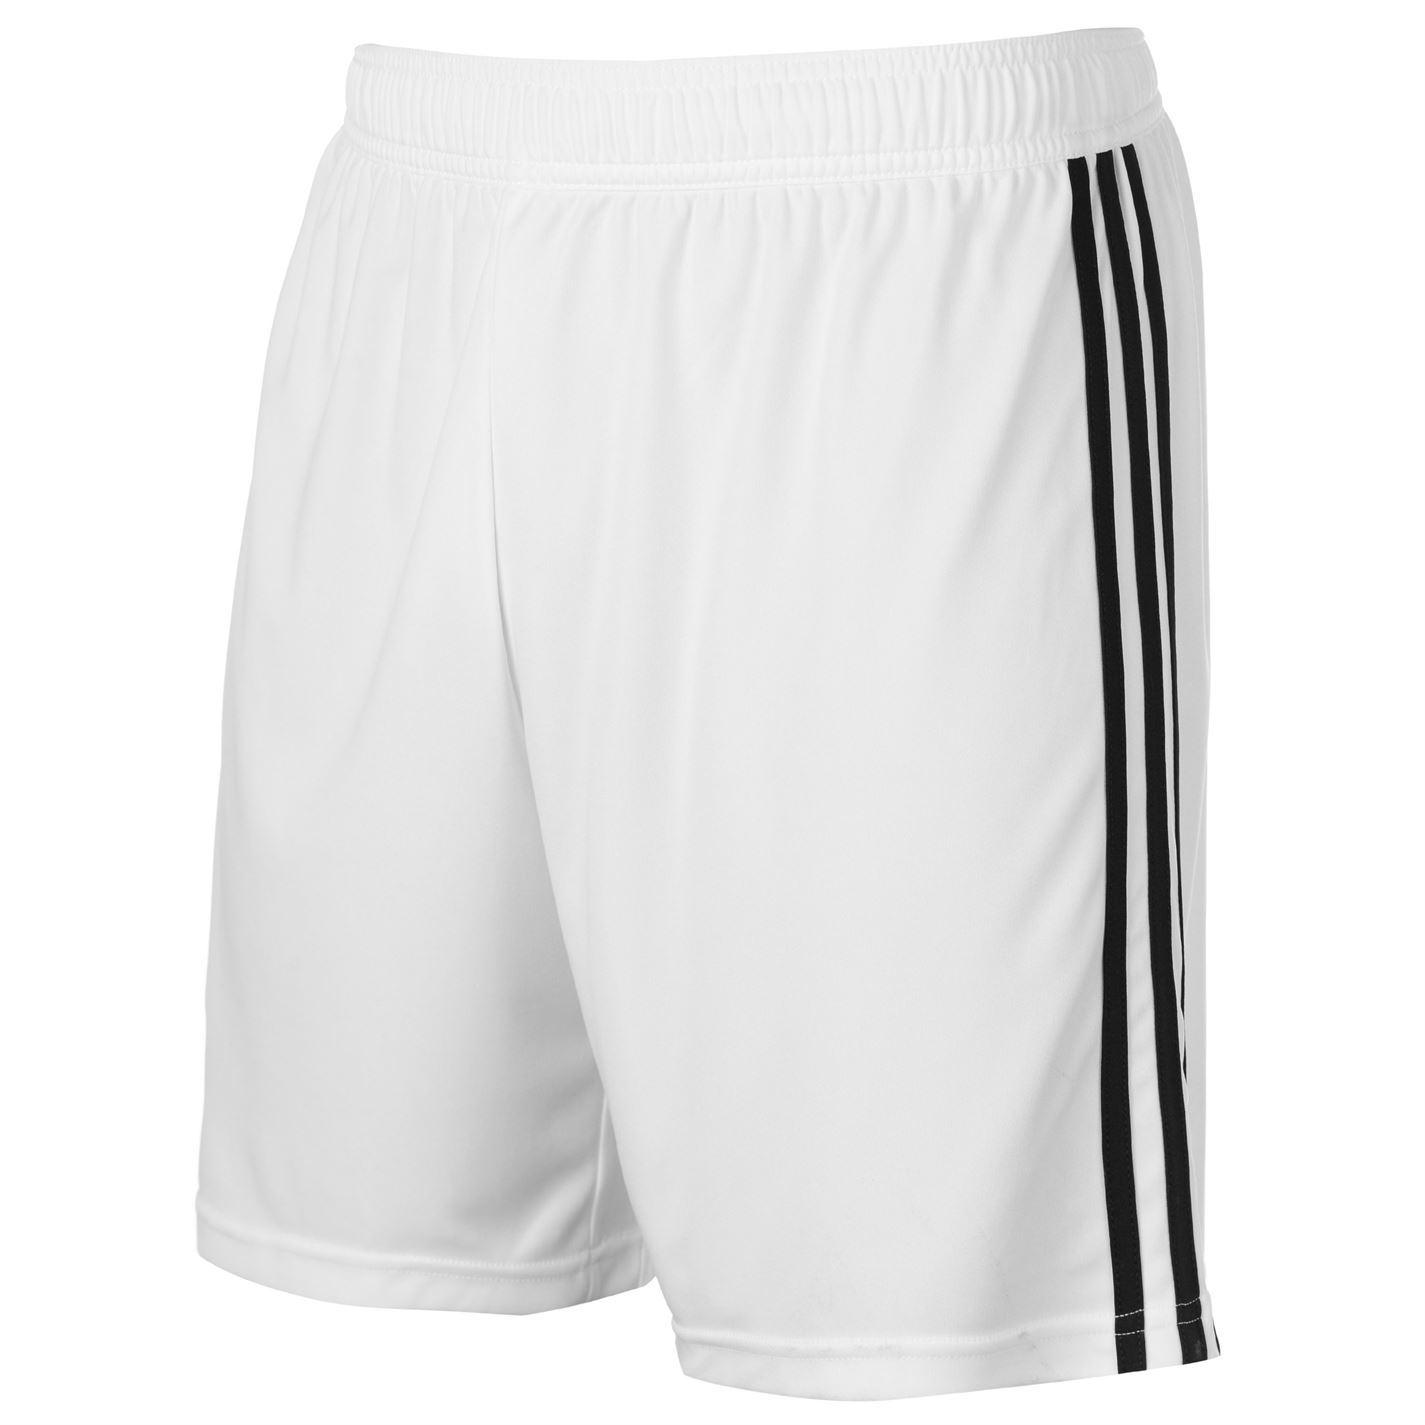 bec926085 ... adidas Real Madrid Home Shorts 2018 19 Mens White/Black Football Soccer  ...